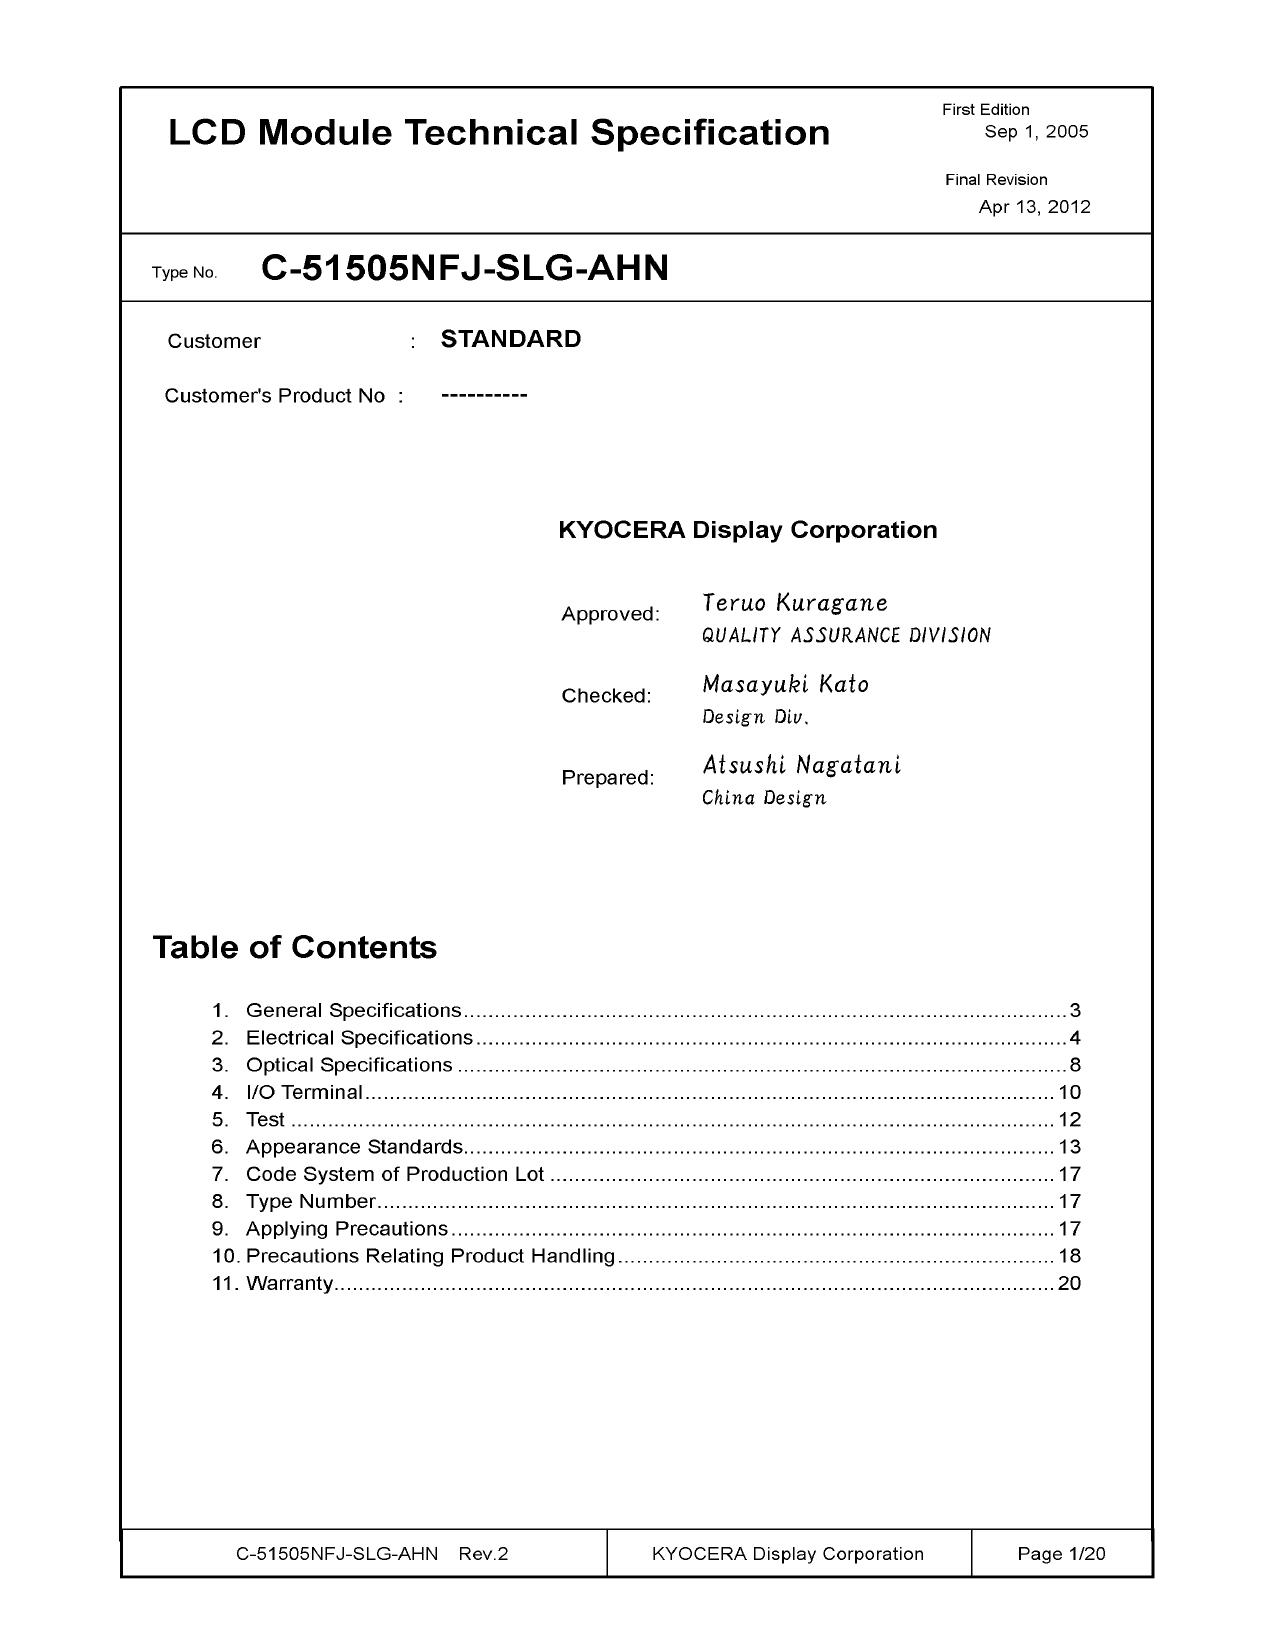 C-51505NFJ-SLG-AHN دیتاشیت PDF